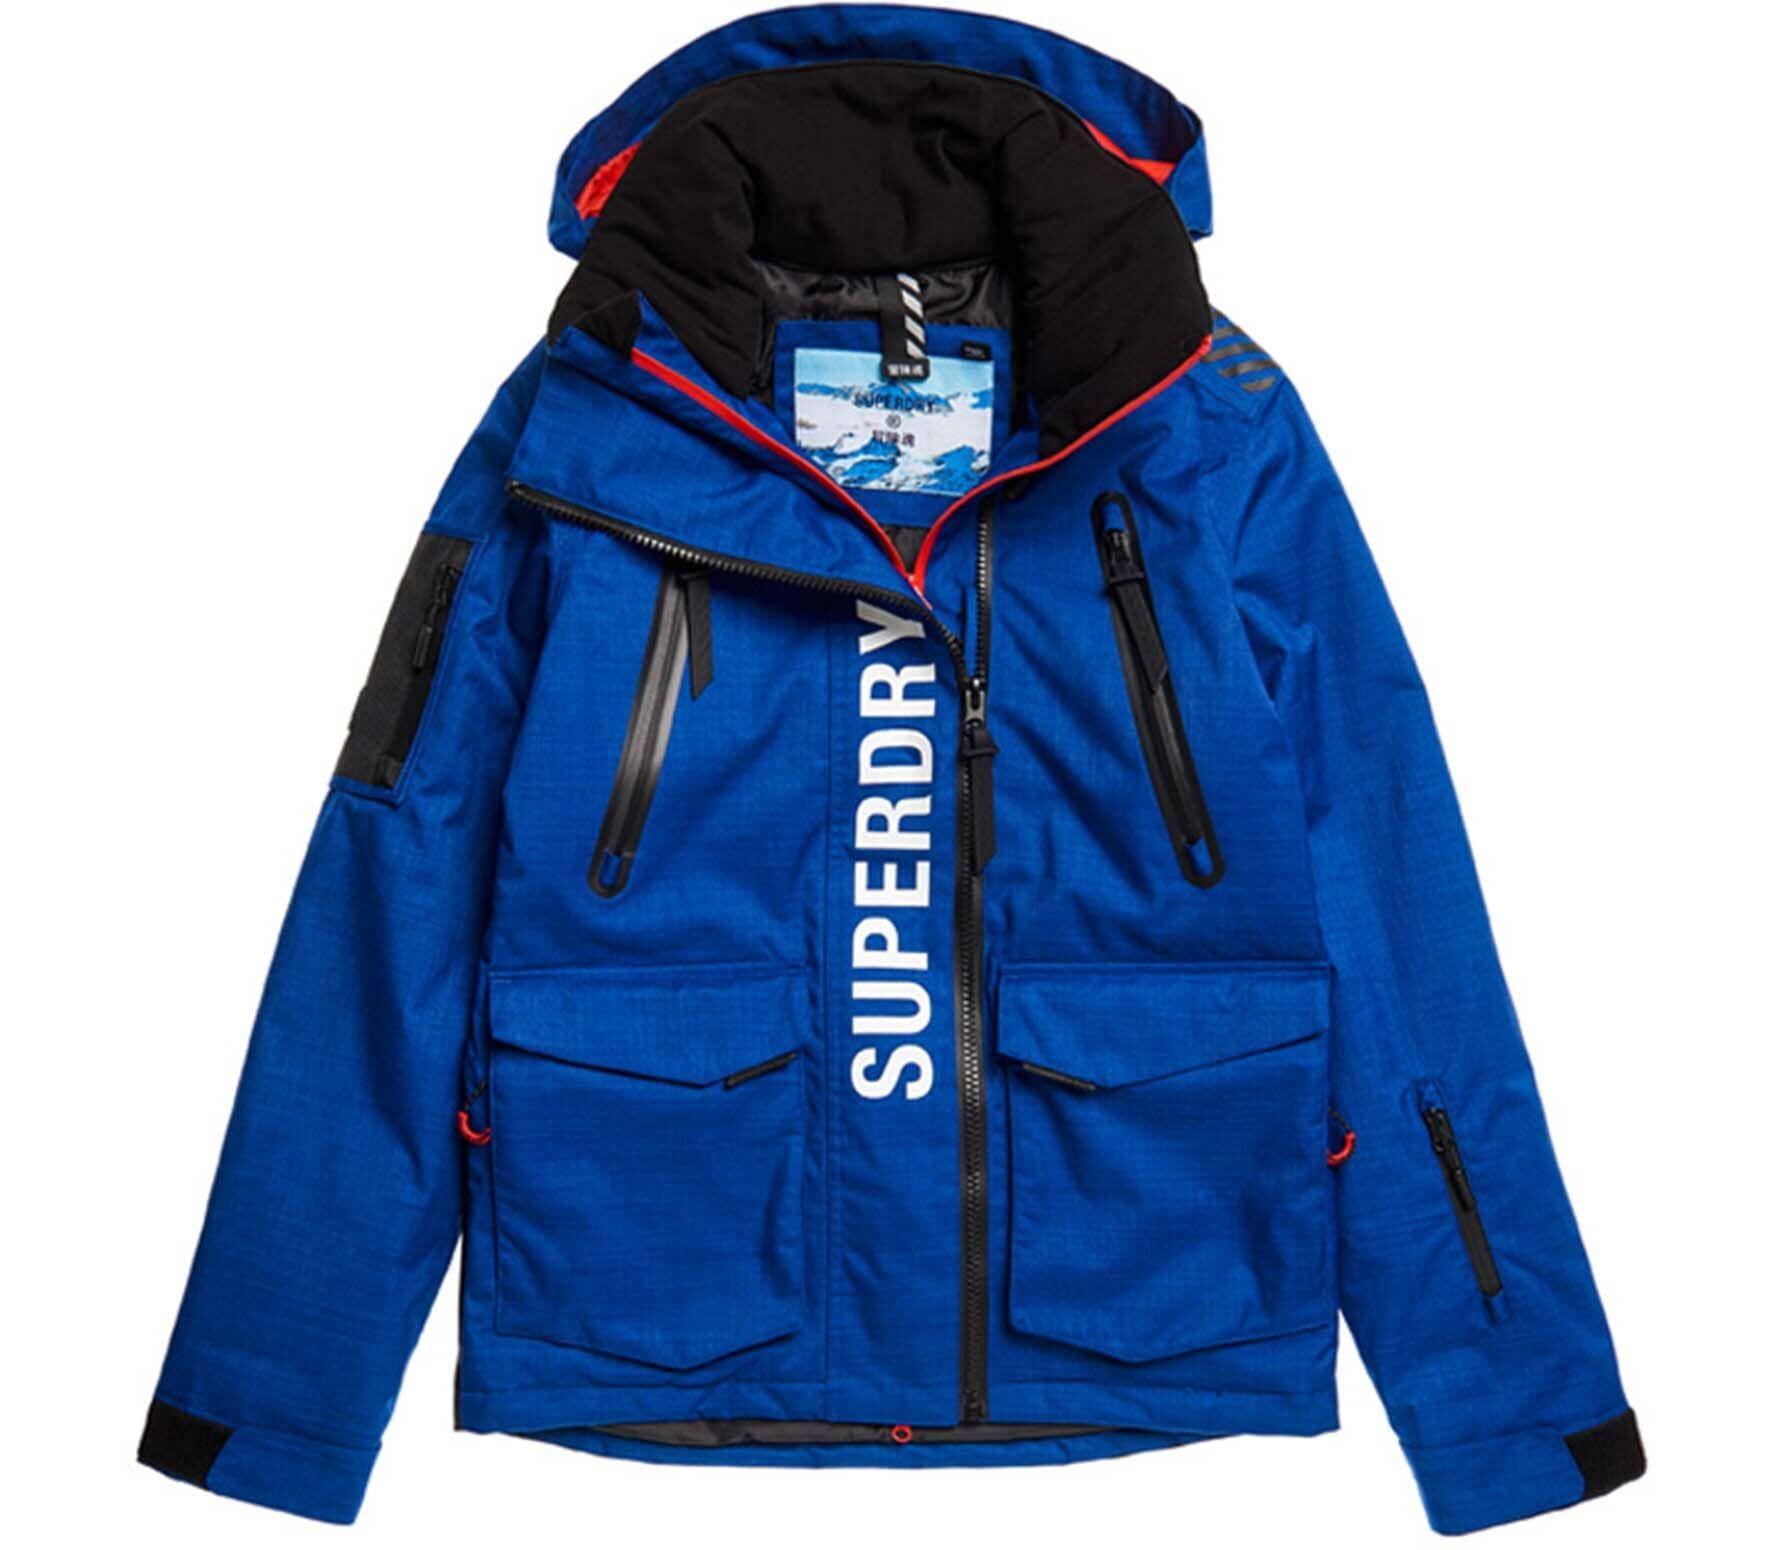 SUPERDRY SPORT® Ultimate Mountain Rescue Herr Skidjacka 48